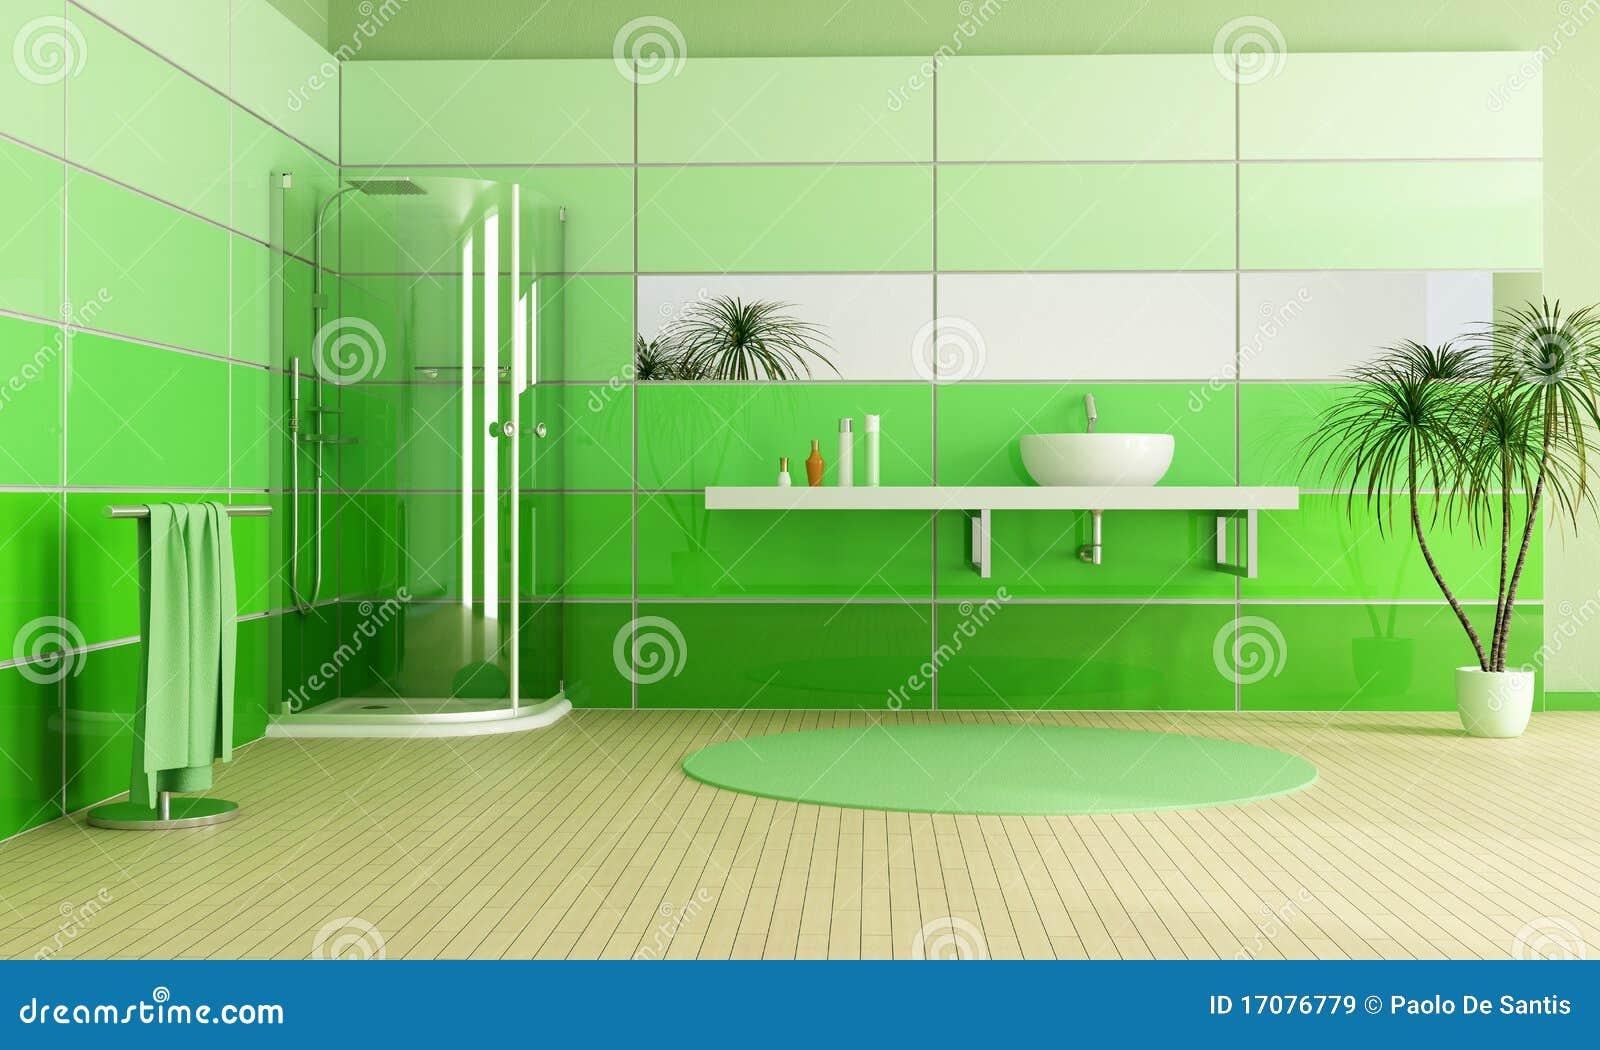 salle de bains verte moderne images libres de droits. Black Bedroom Furniture Sets. Home Design Ideas